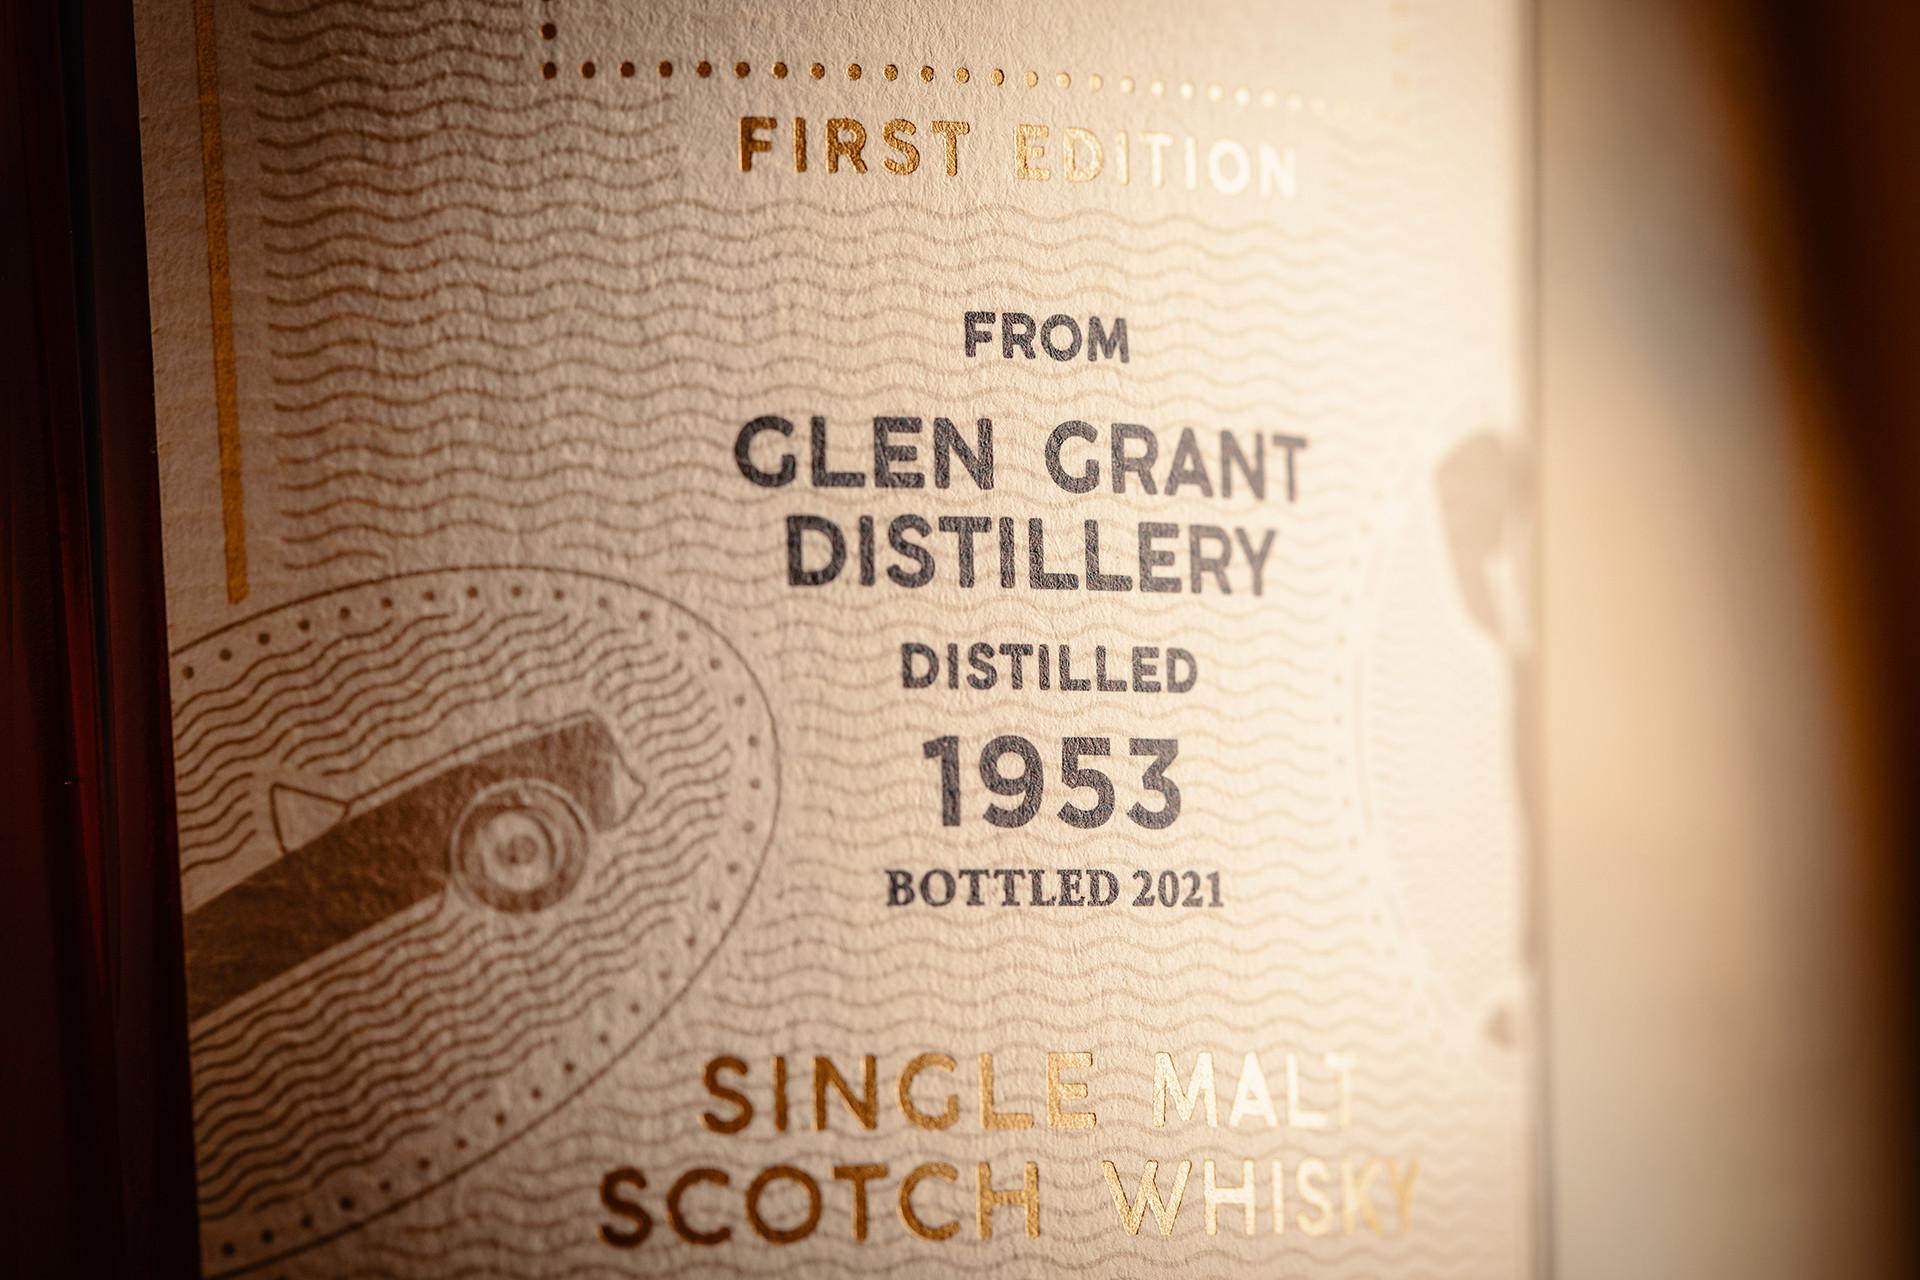 Gordon & MacPhail Mr George Legacy Series, Glen Grant 1953